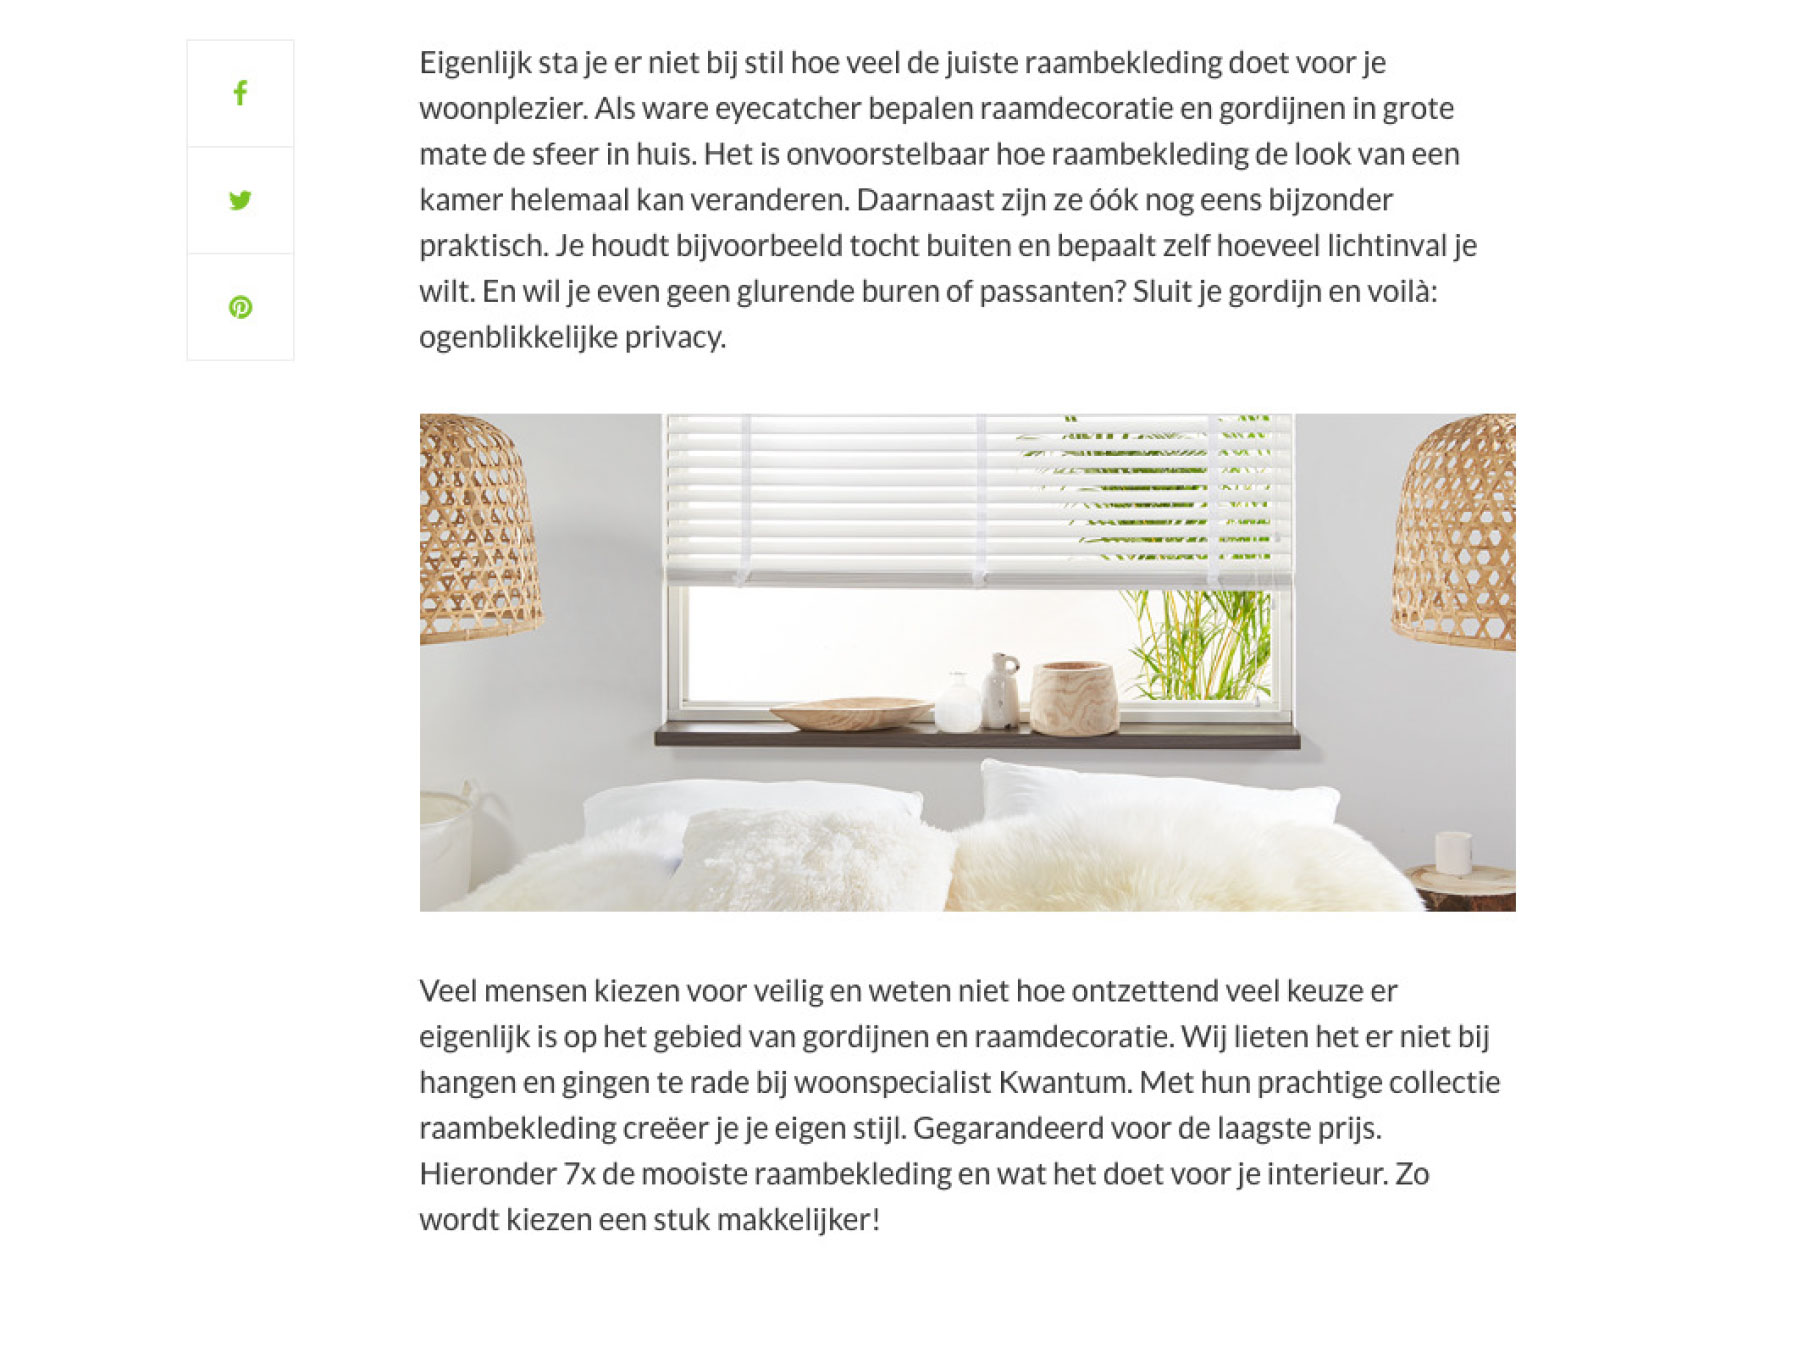 http://inktzwartekaters.nl/wp-content/uploads/2017/09/kwantum3.jpg